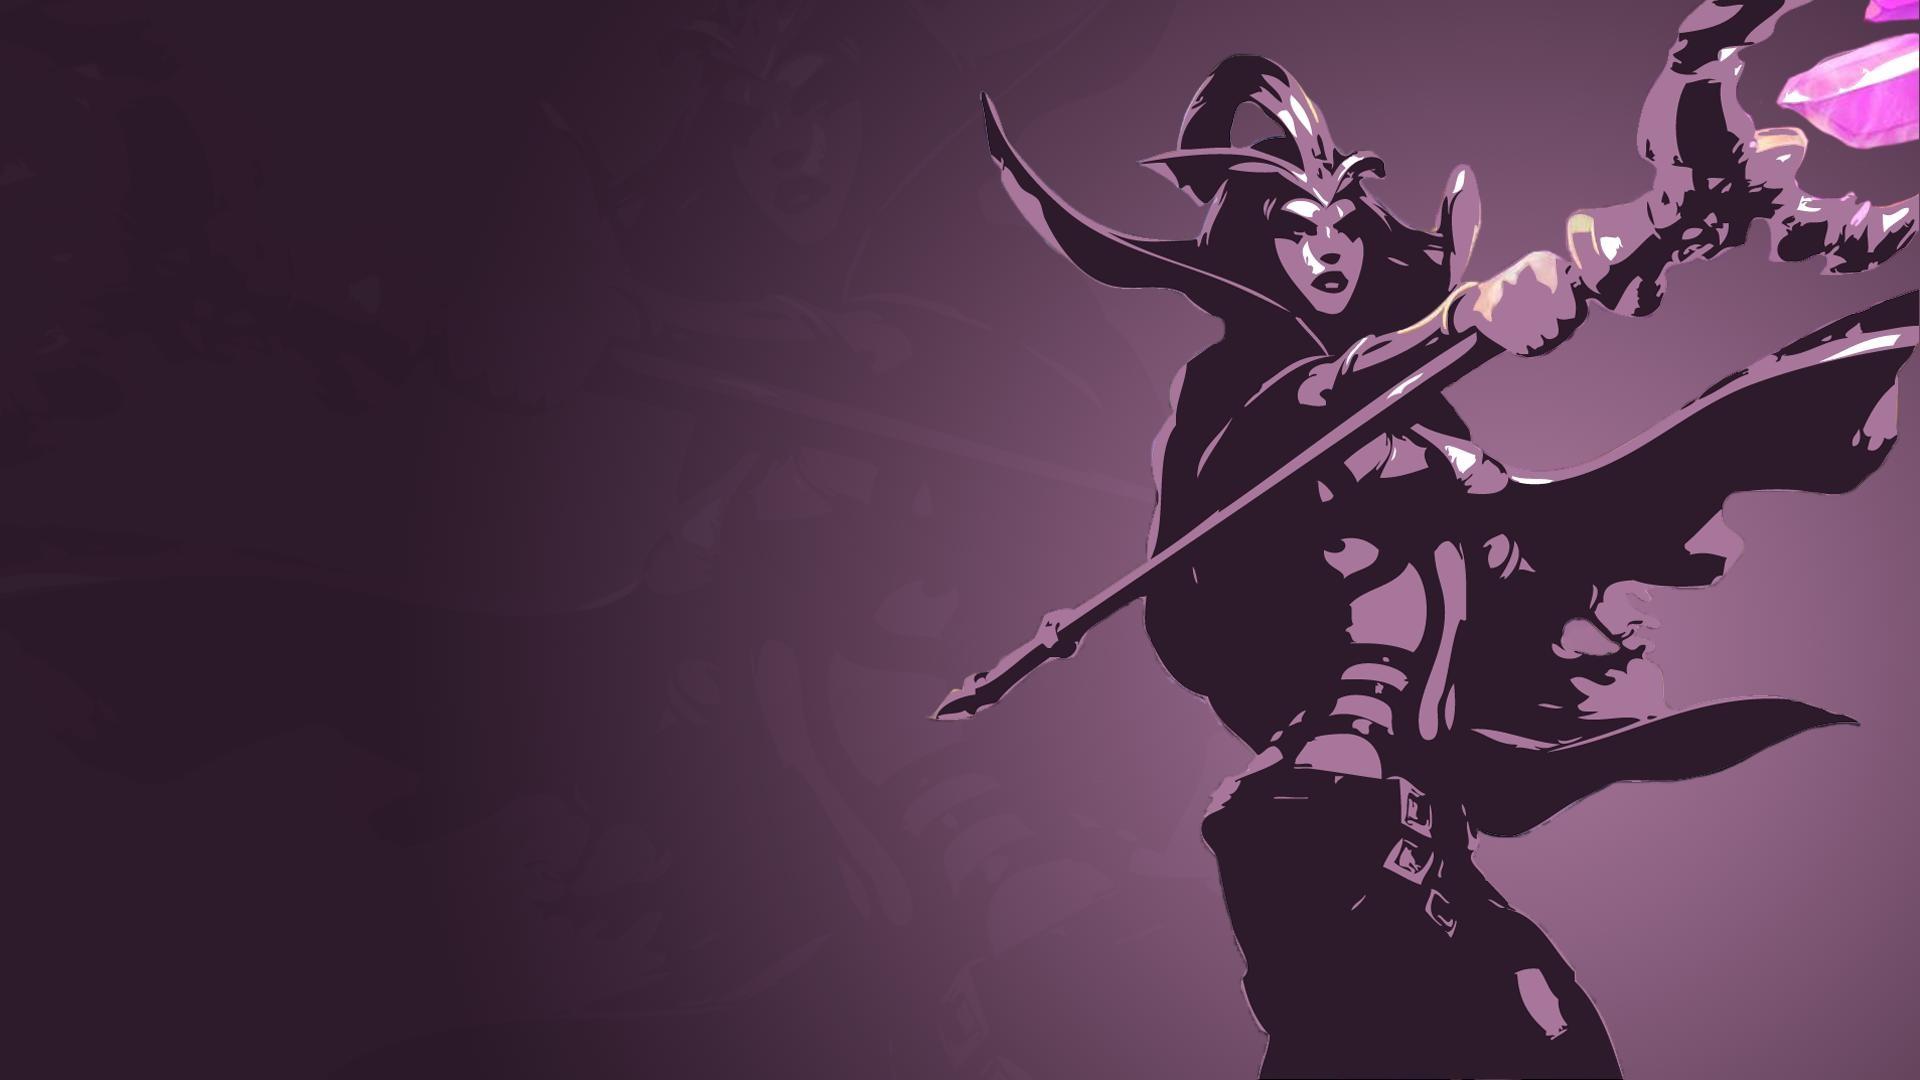 Wallpaper Illustration Video Games Women Simple Background